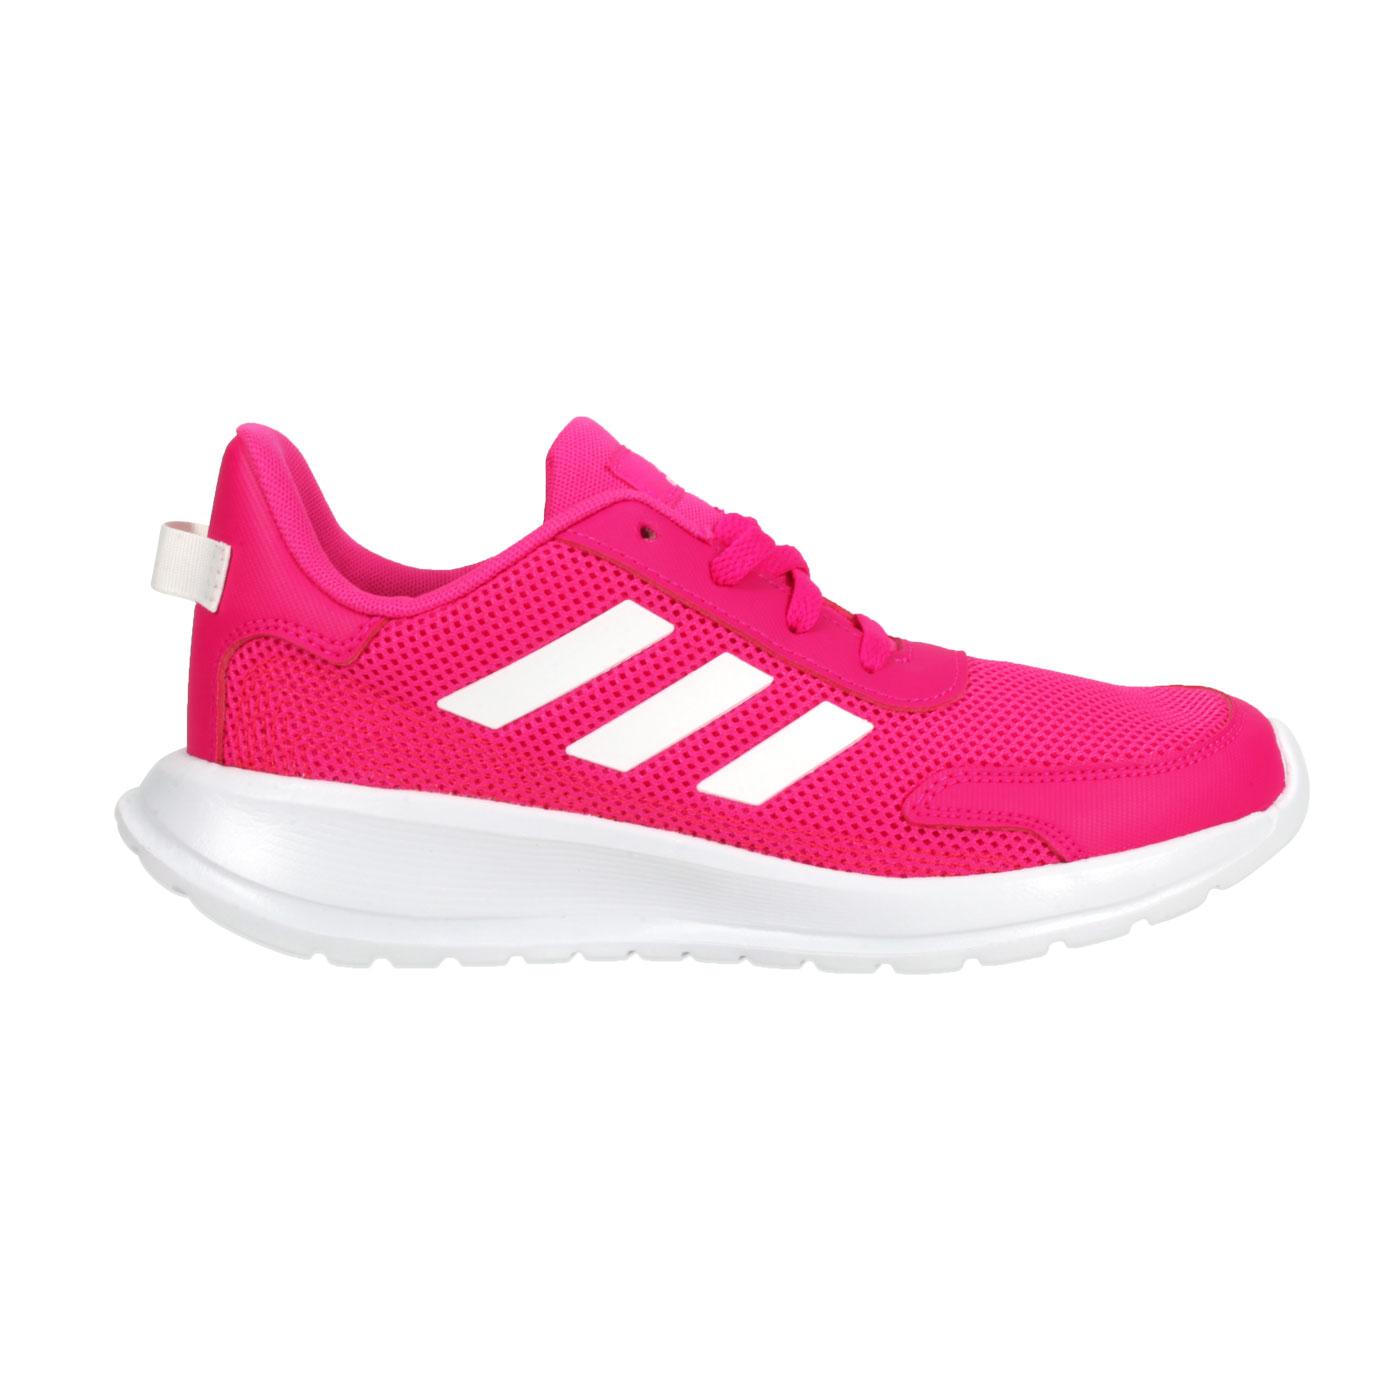 ADIDAS 大童休閒運動鞋  @TENSAUR RUN K@EG4126